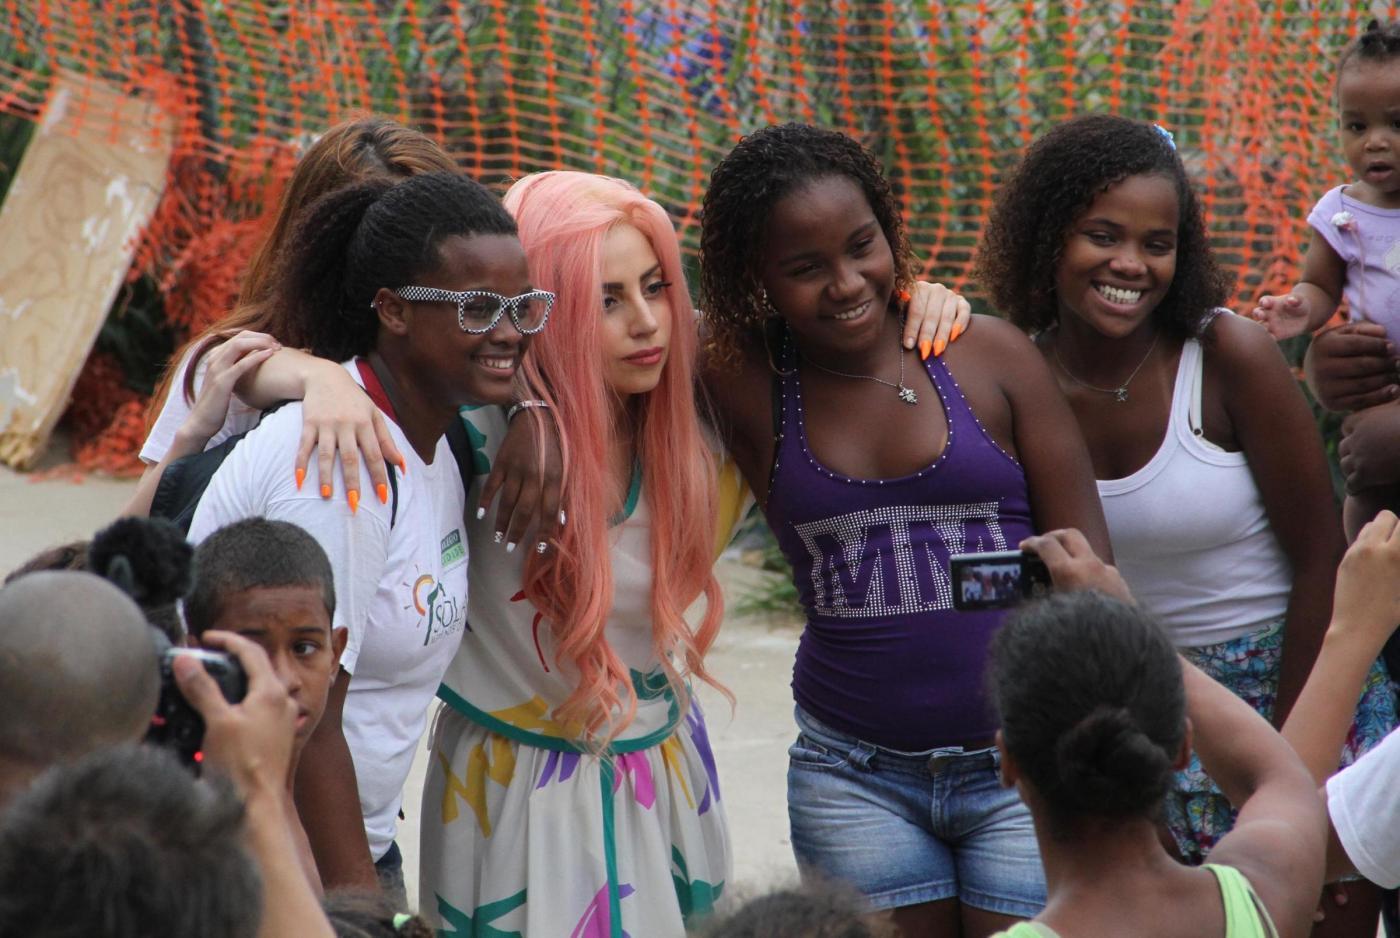 Lady Gaga a piedi nudi a Rio de Janeiro08